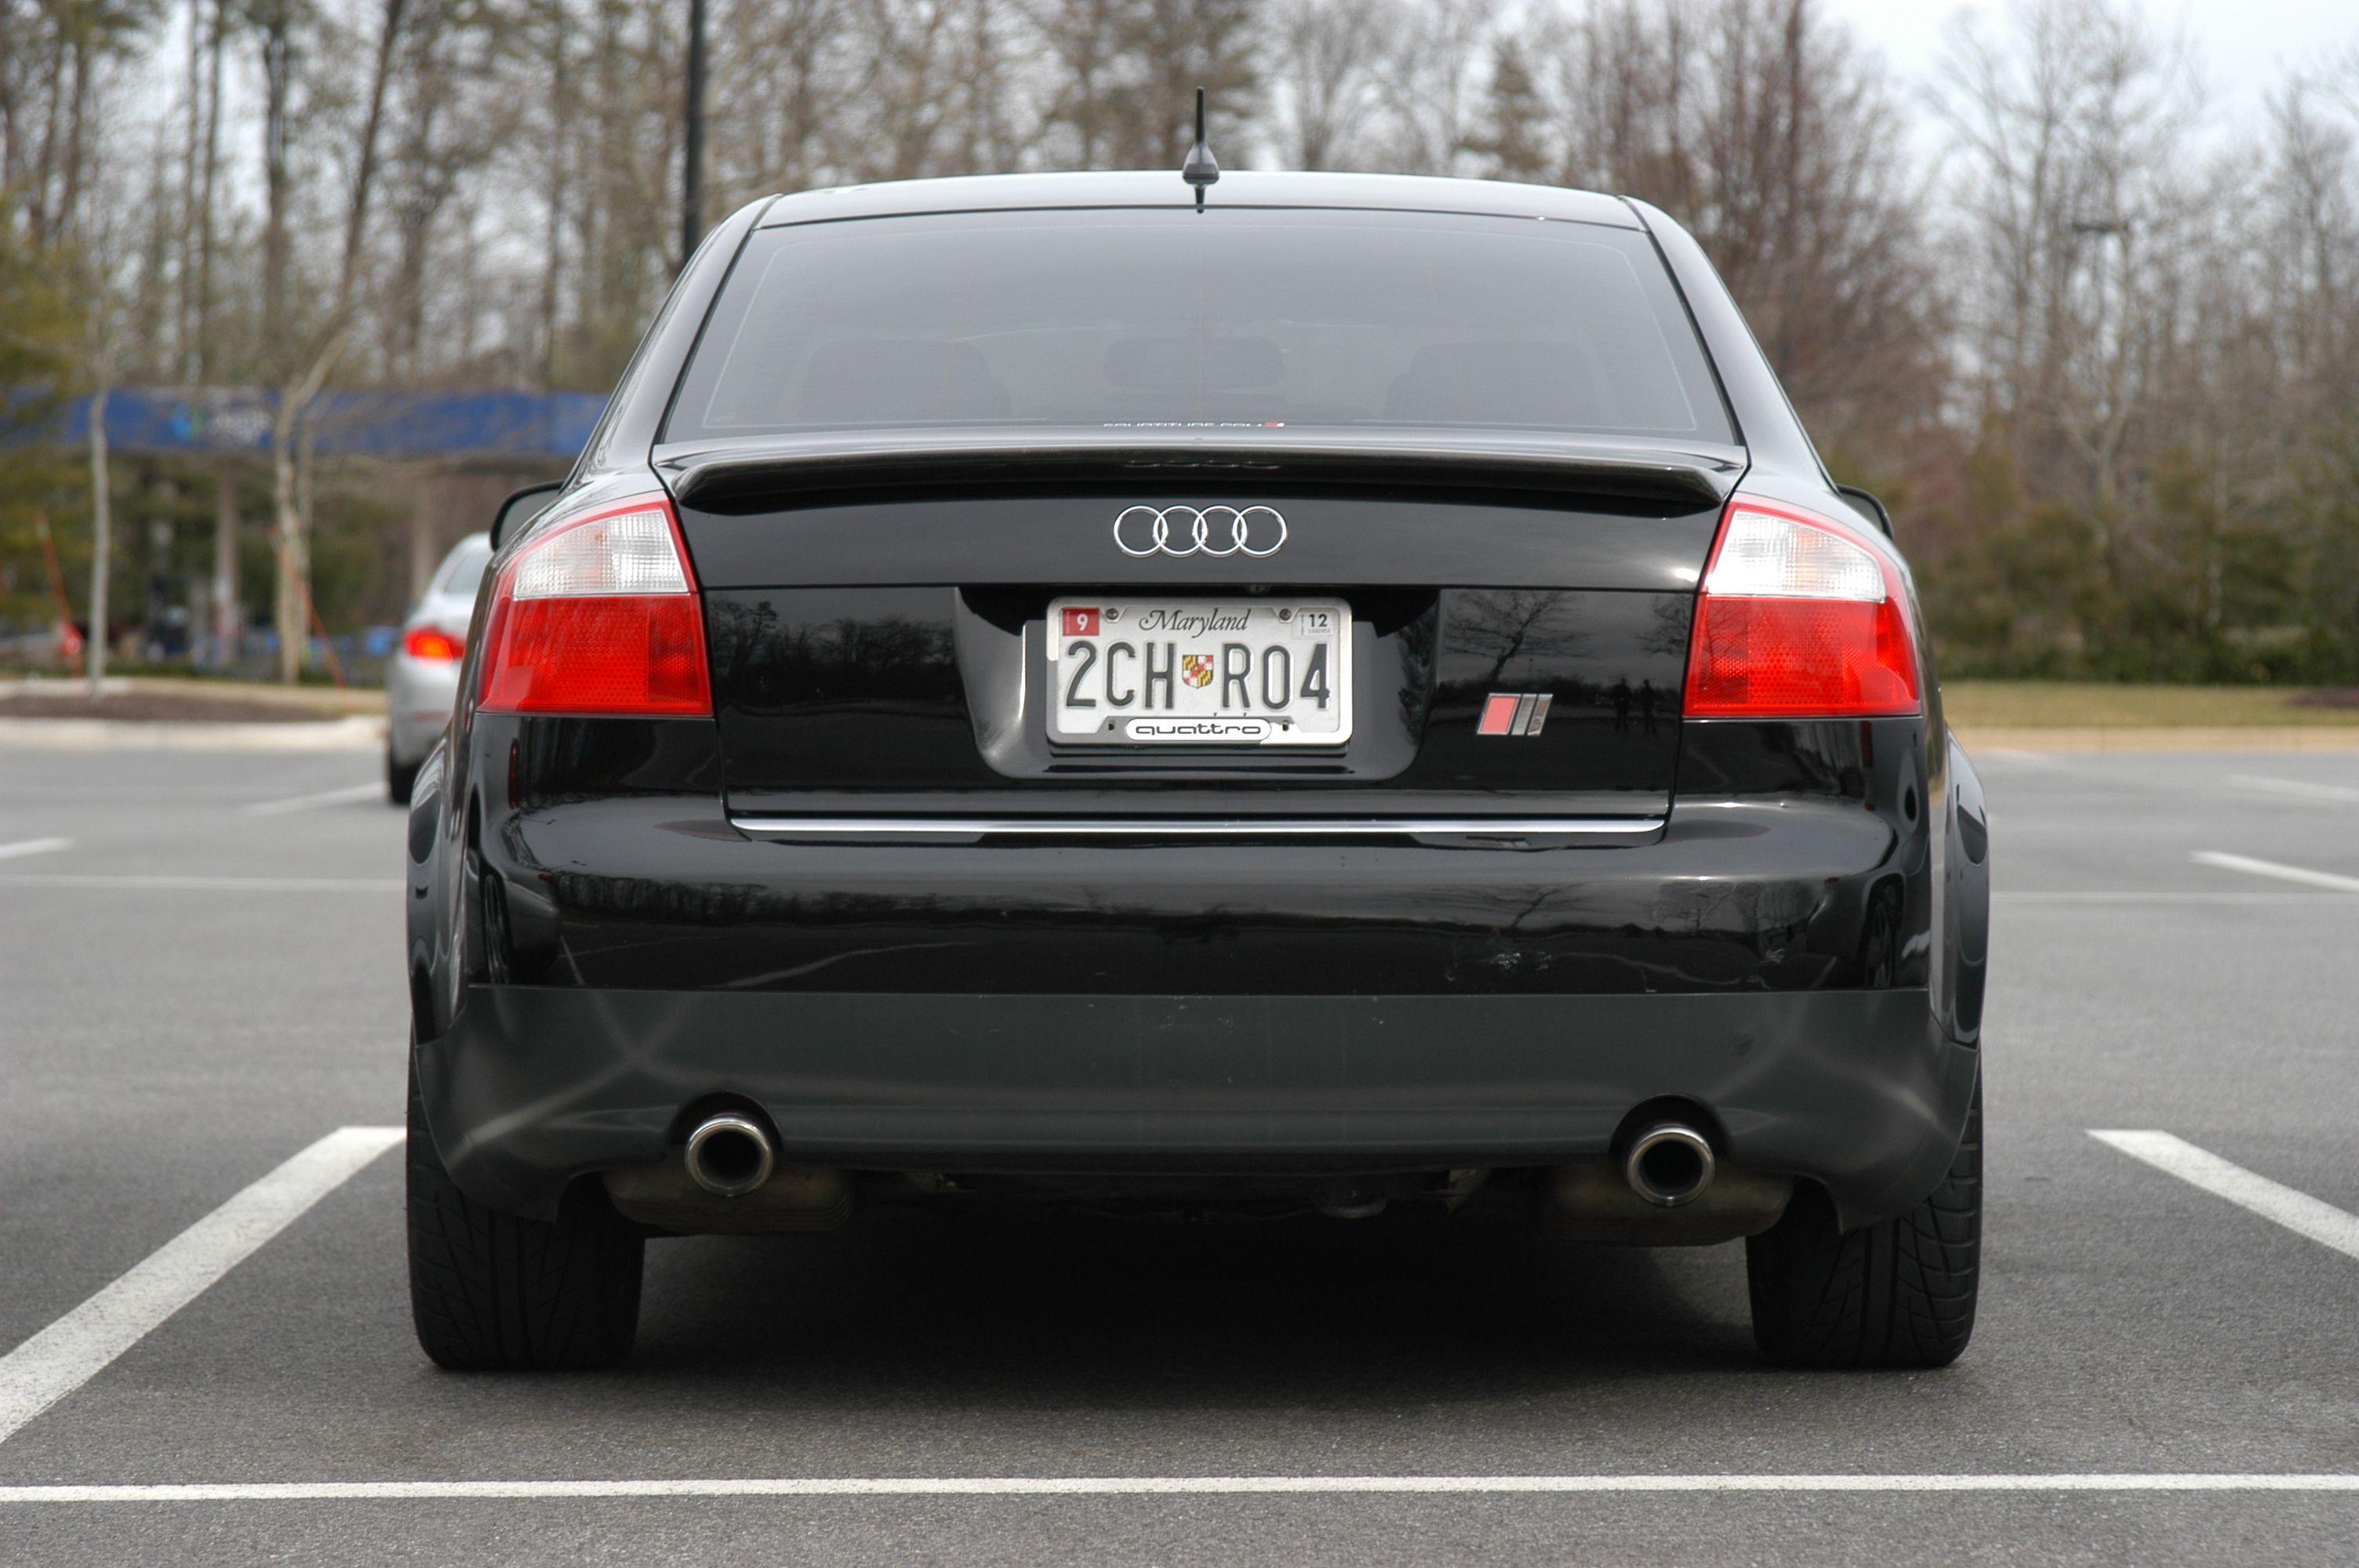 Audi A4 B6 Audi Audi A4 Car